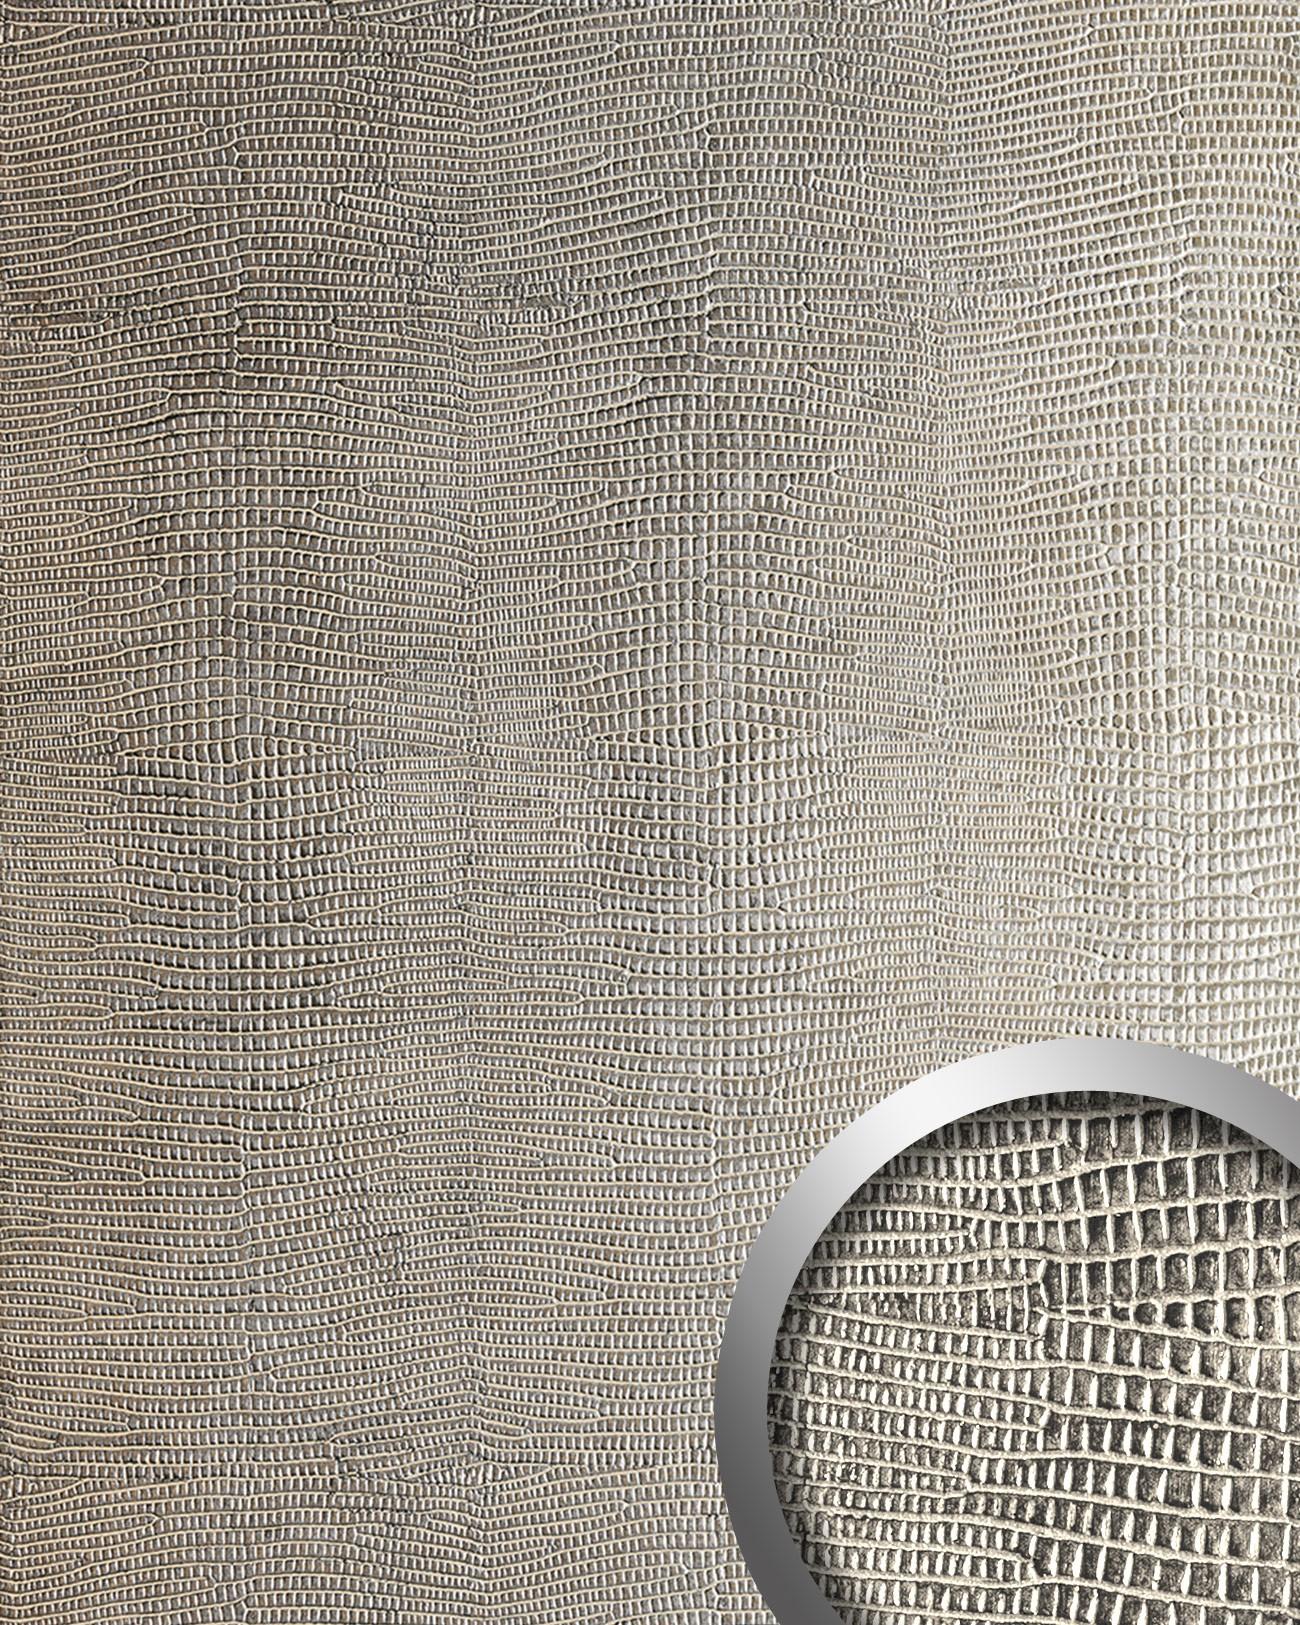 leguan design rev tement mural auto adh sif wallface 12893 aimantin simili cuir peau iguane gris. Black Bedroom Furniture Sets. Home Design Ideas